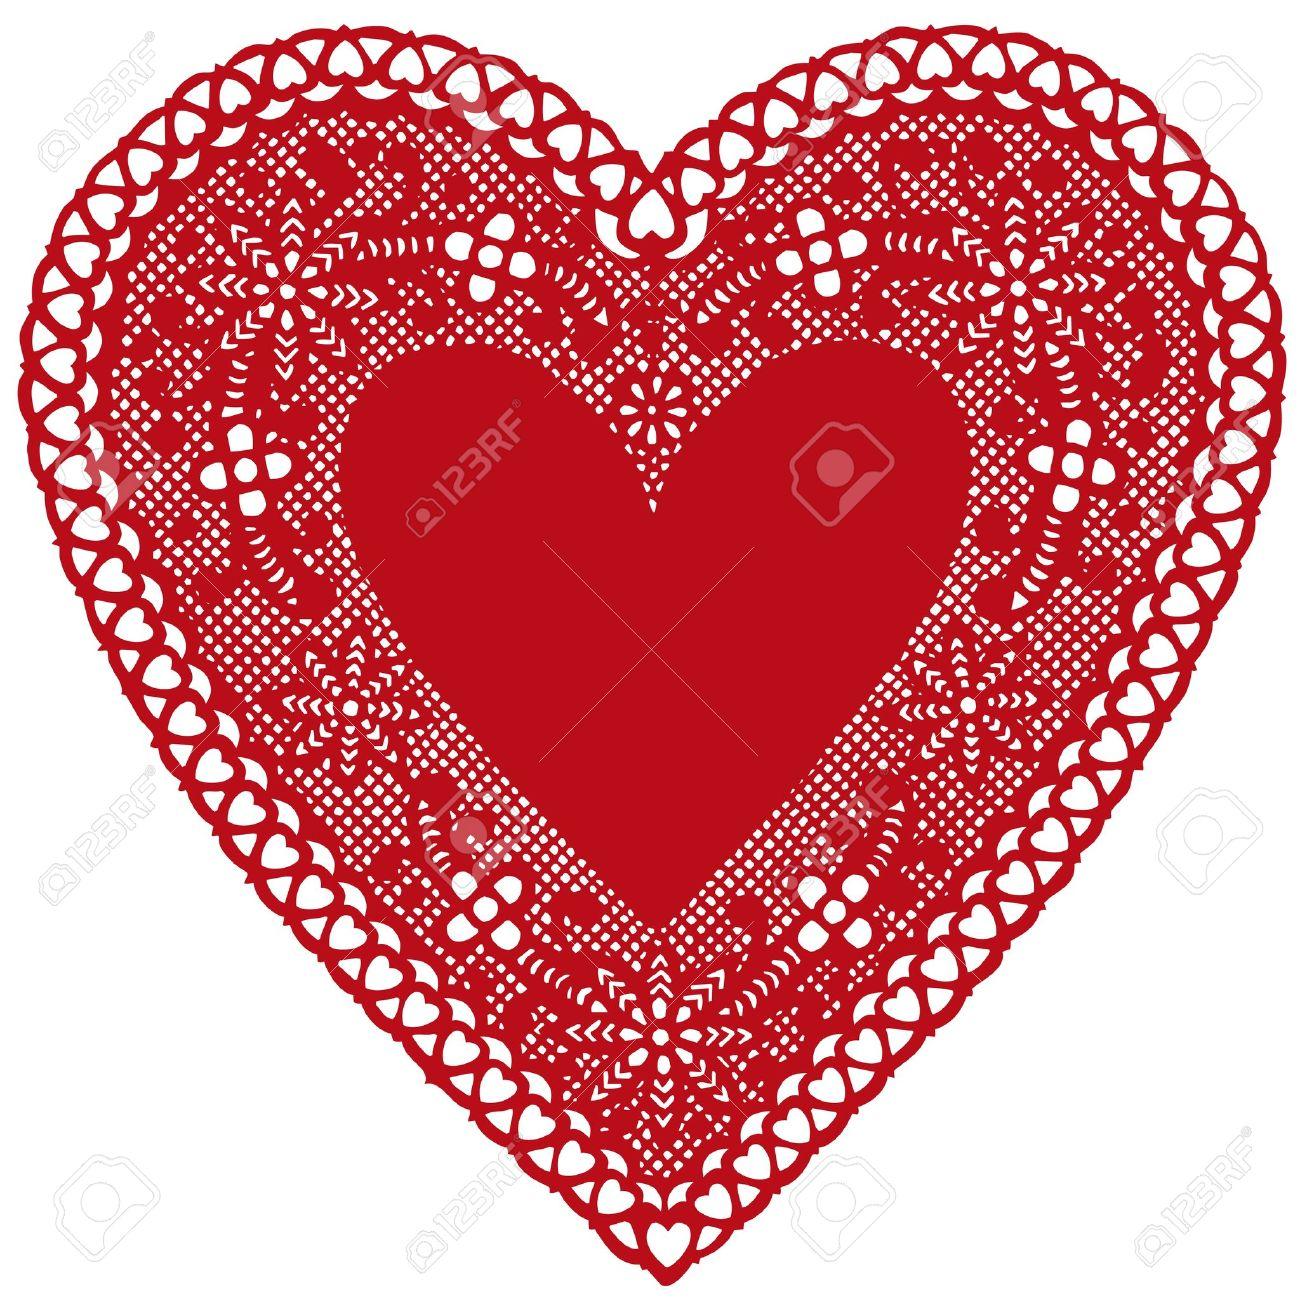 Doily Heart Clipart.